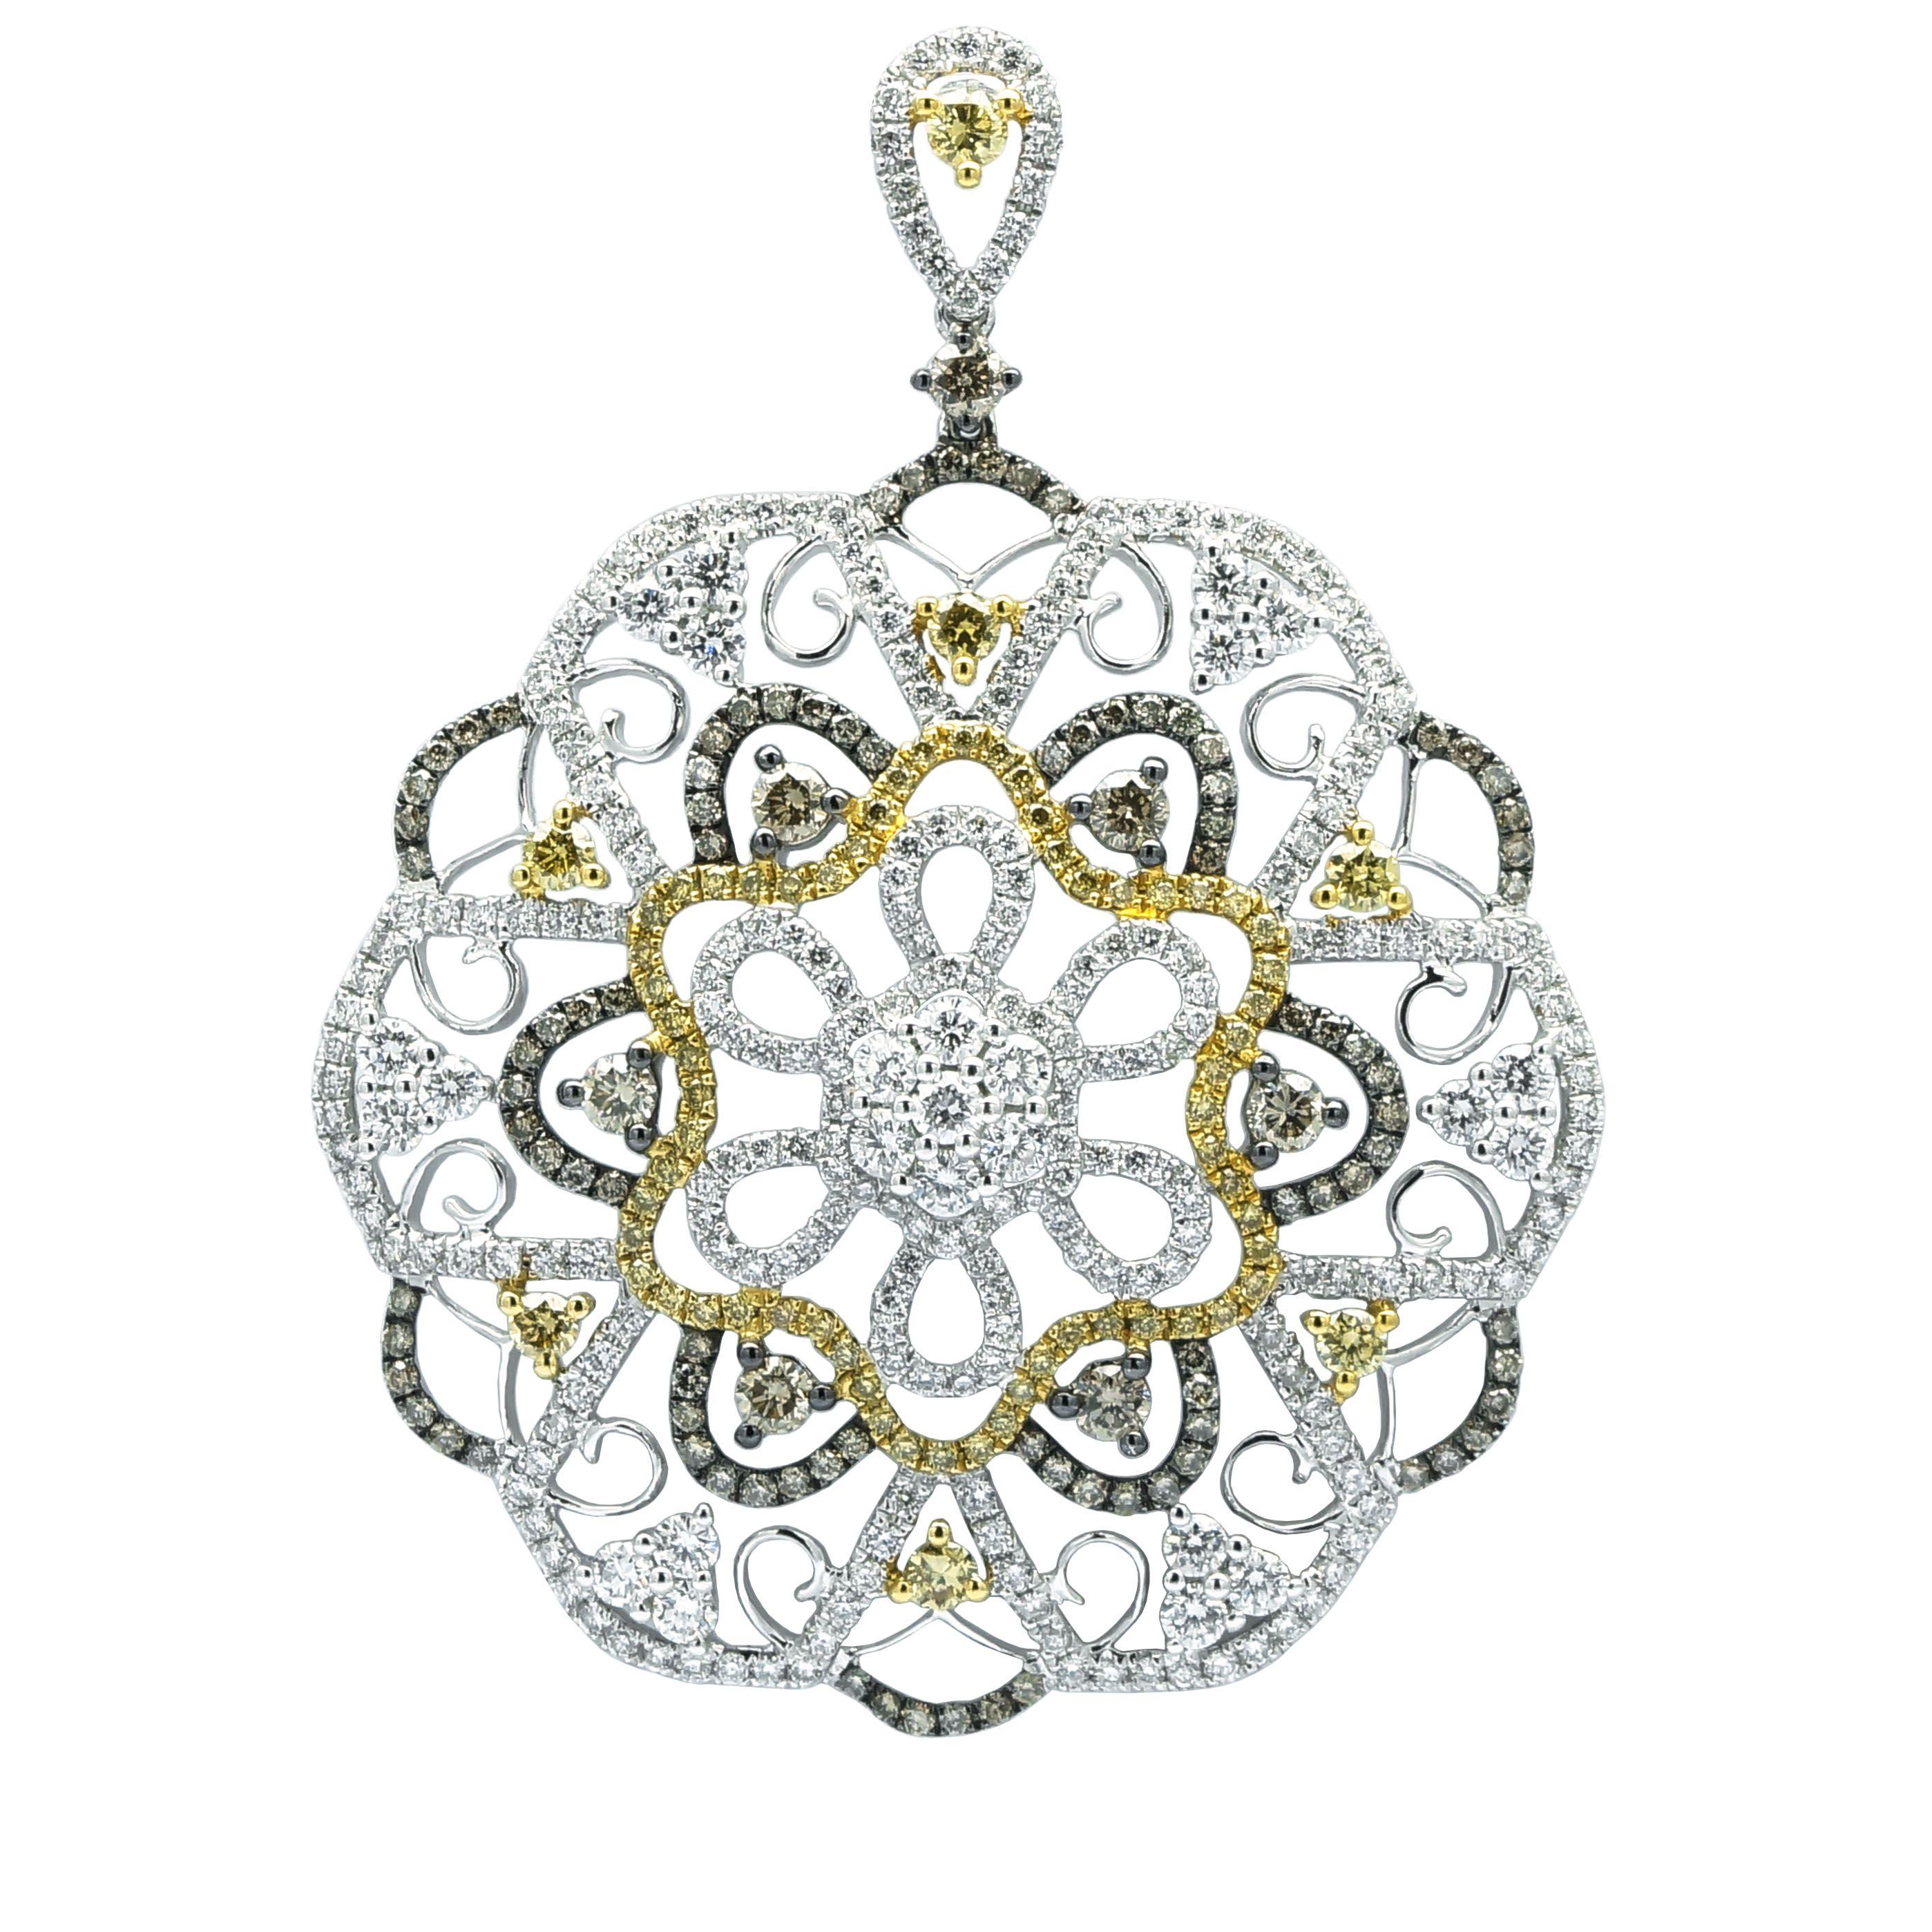 Sunrise Jewellery International Co Ltd Booth No 1A705 Yellow